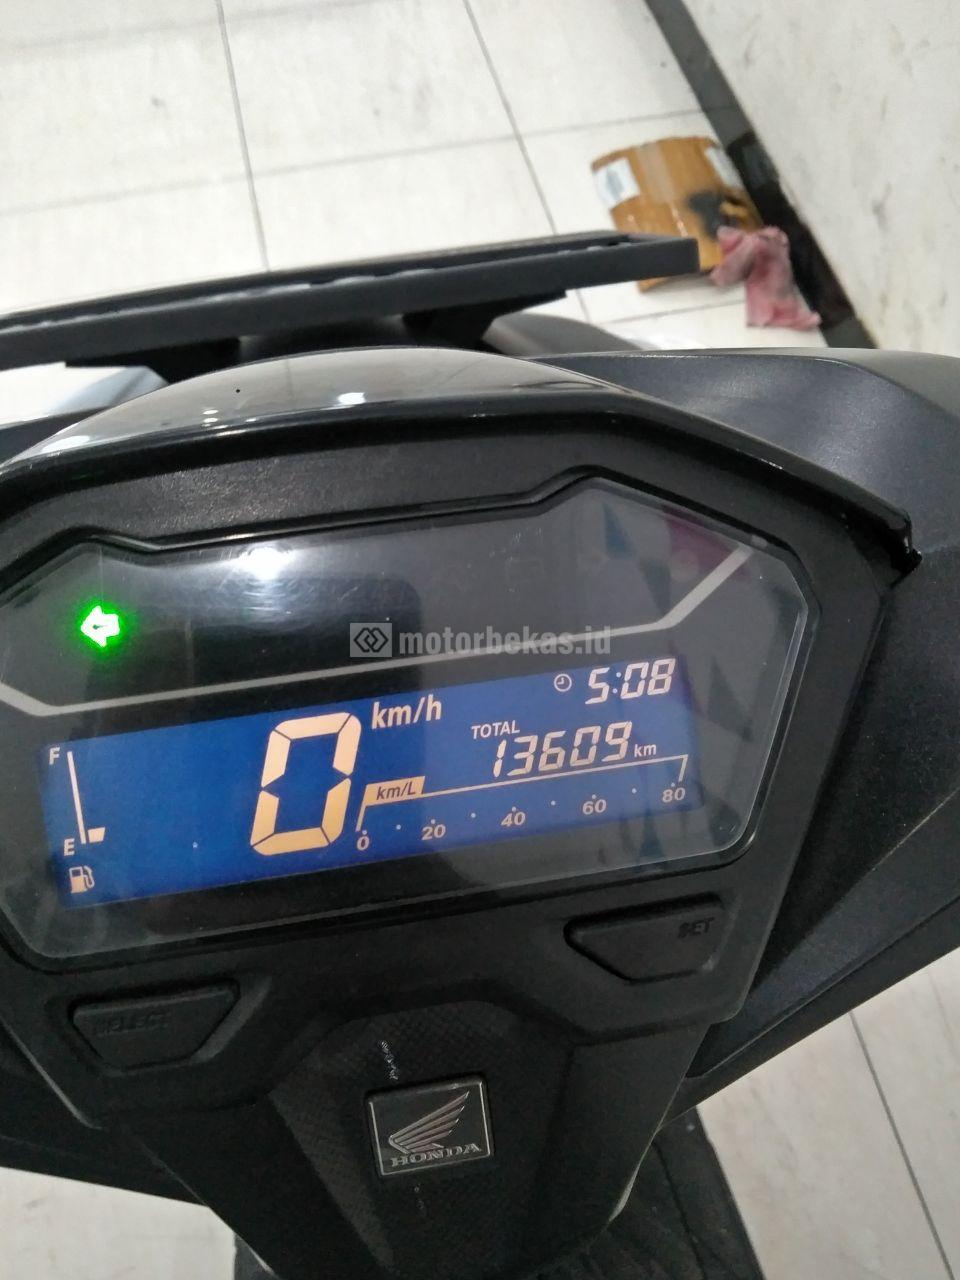 HONDA VARIO 150 SE  4003 motorbekas.id